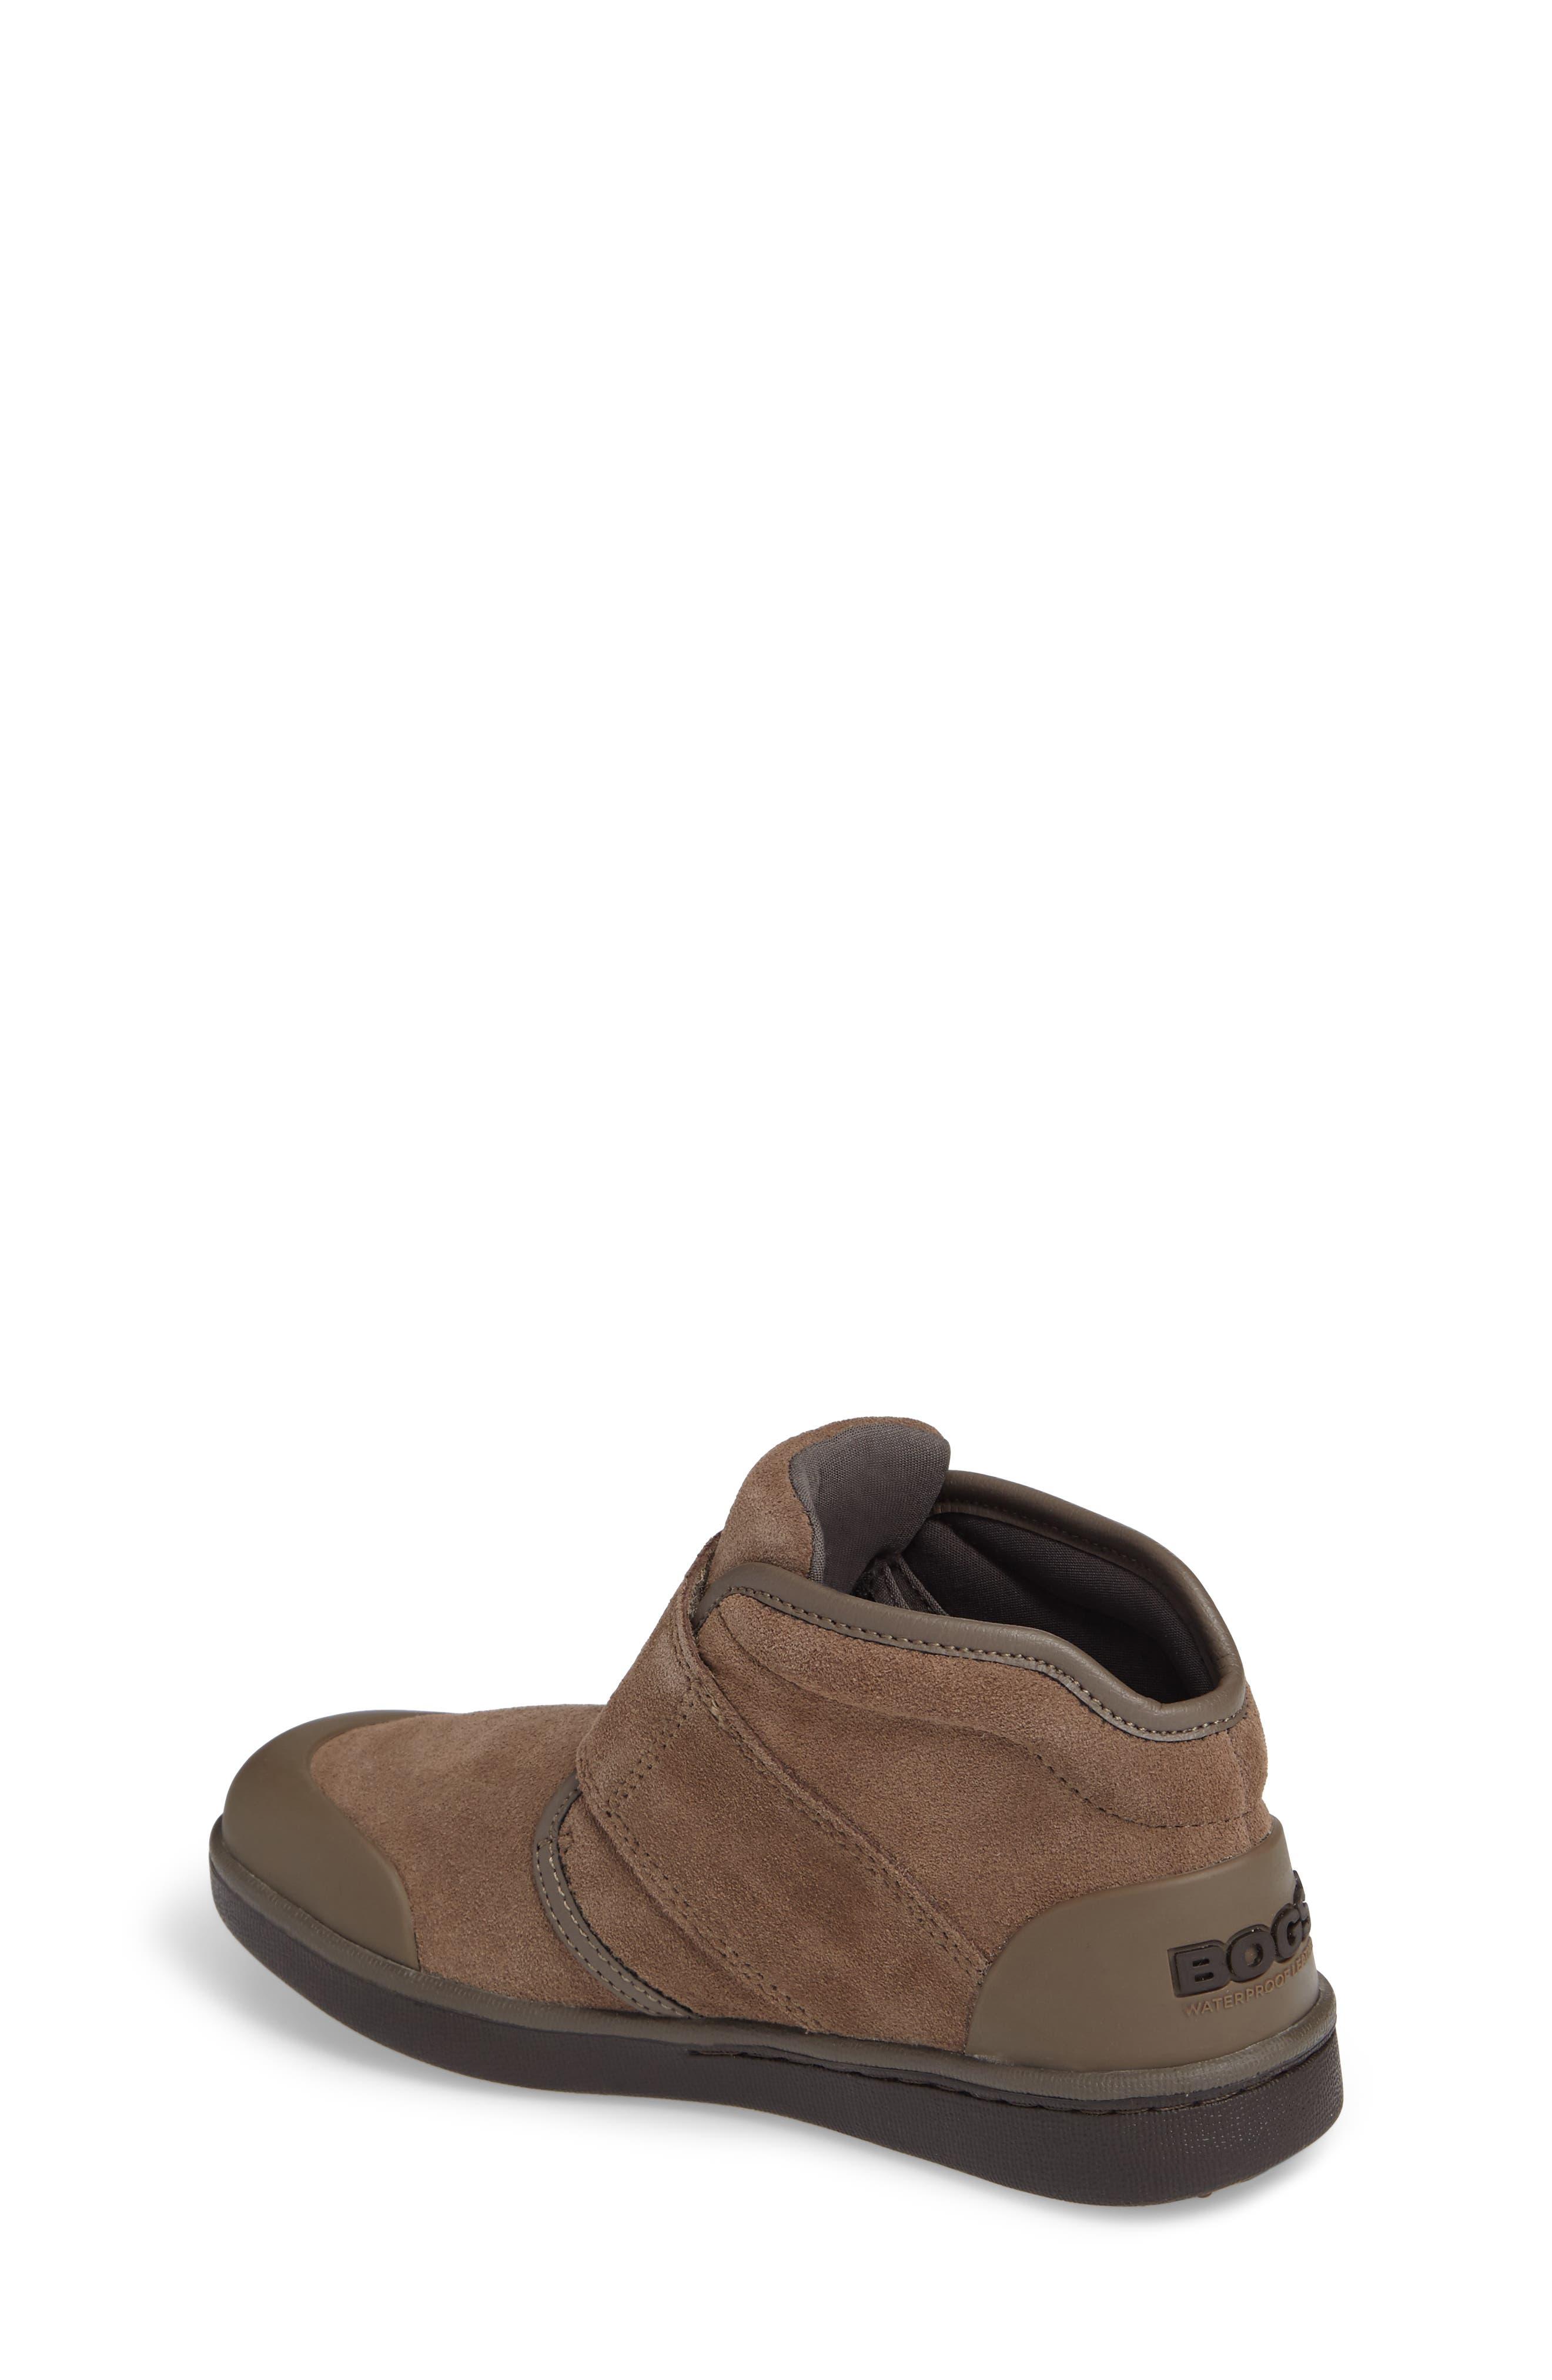 'Sammy' Waterproof Sneaker,                             Alternate thumbnail 2, color,                             TAN